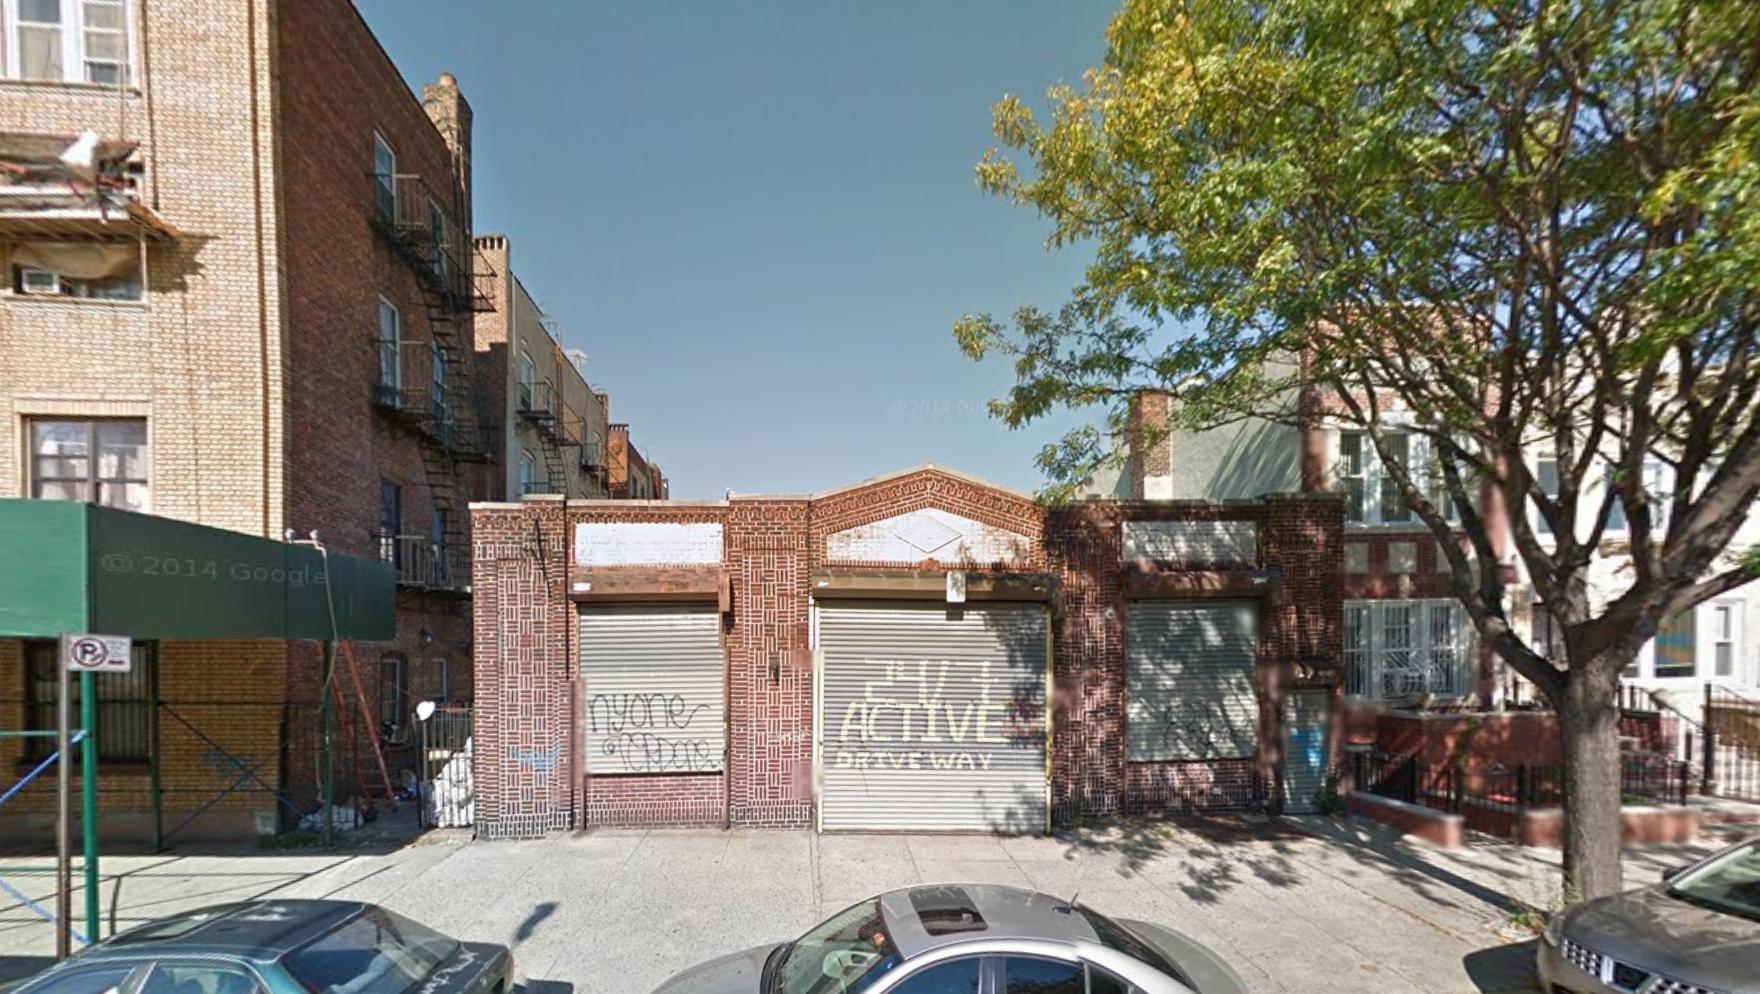 1201 President Street, image via Google Maps